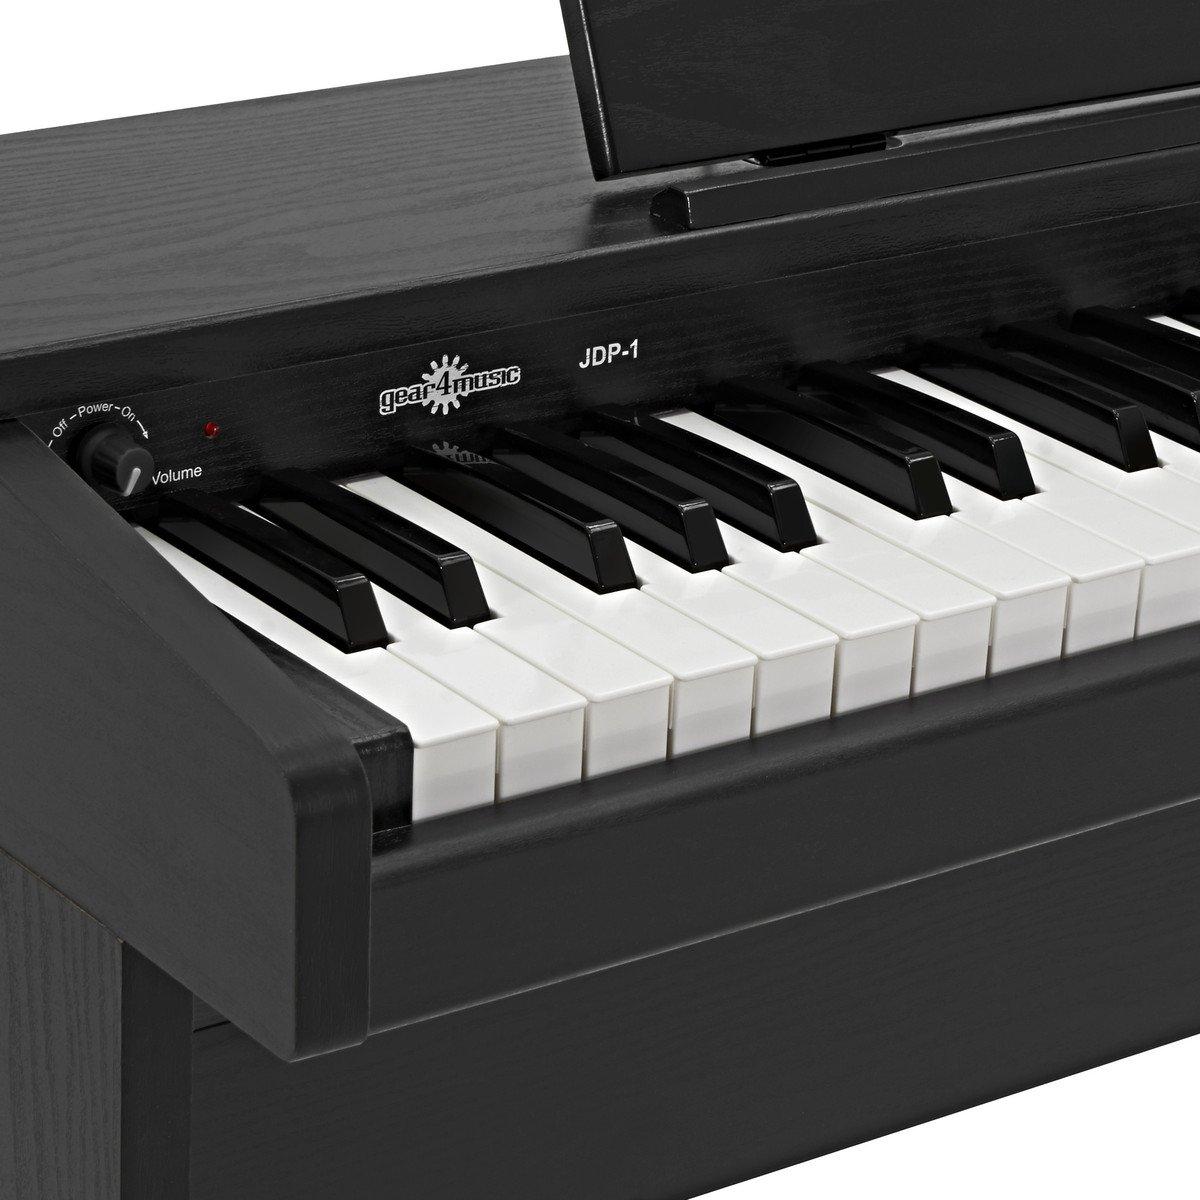 Piano Digital Junior JDP-1 de Gear4music - Negro Mate